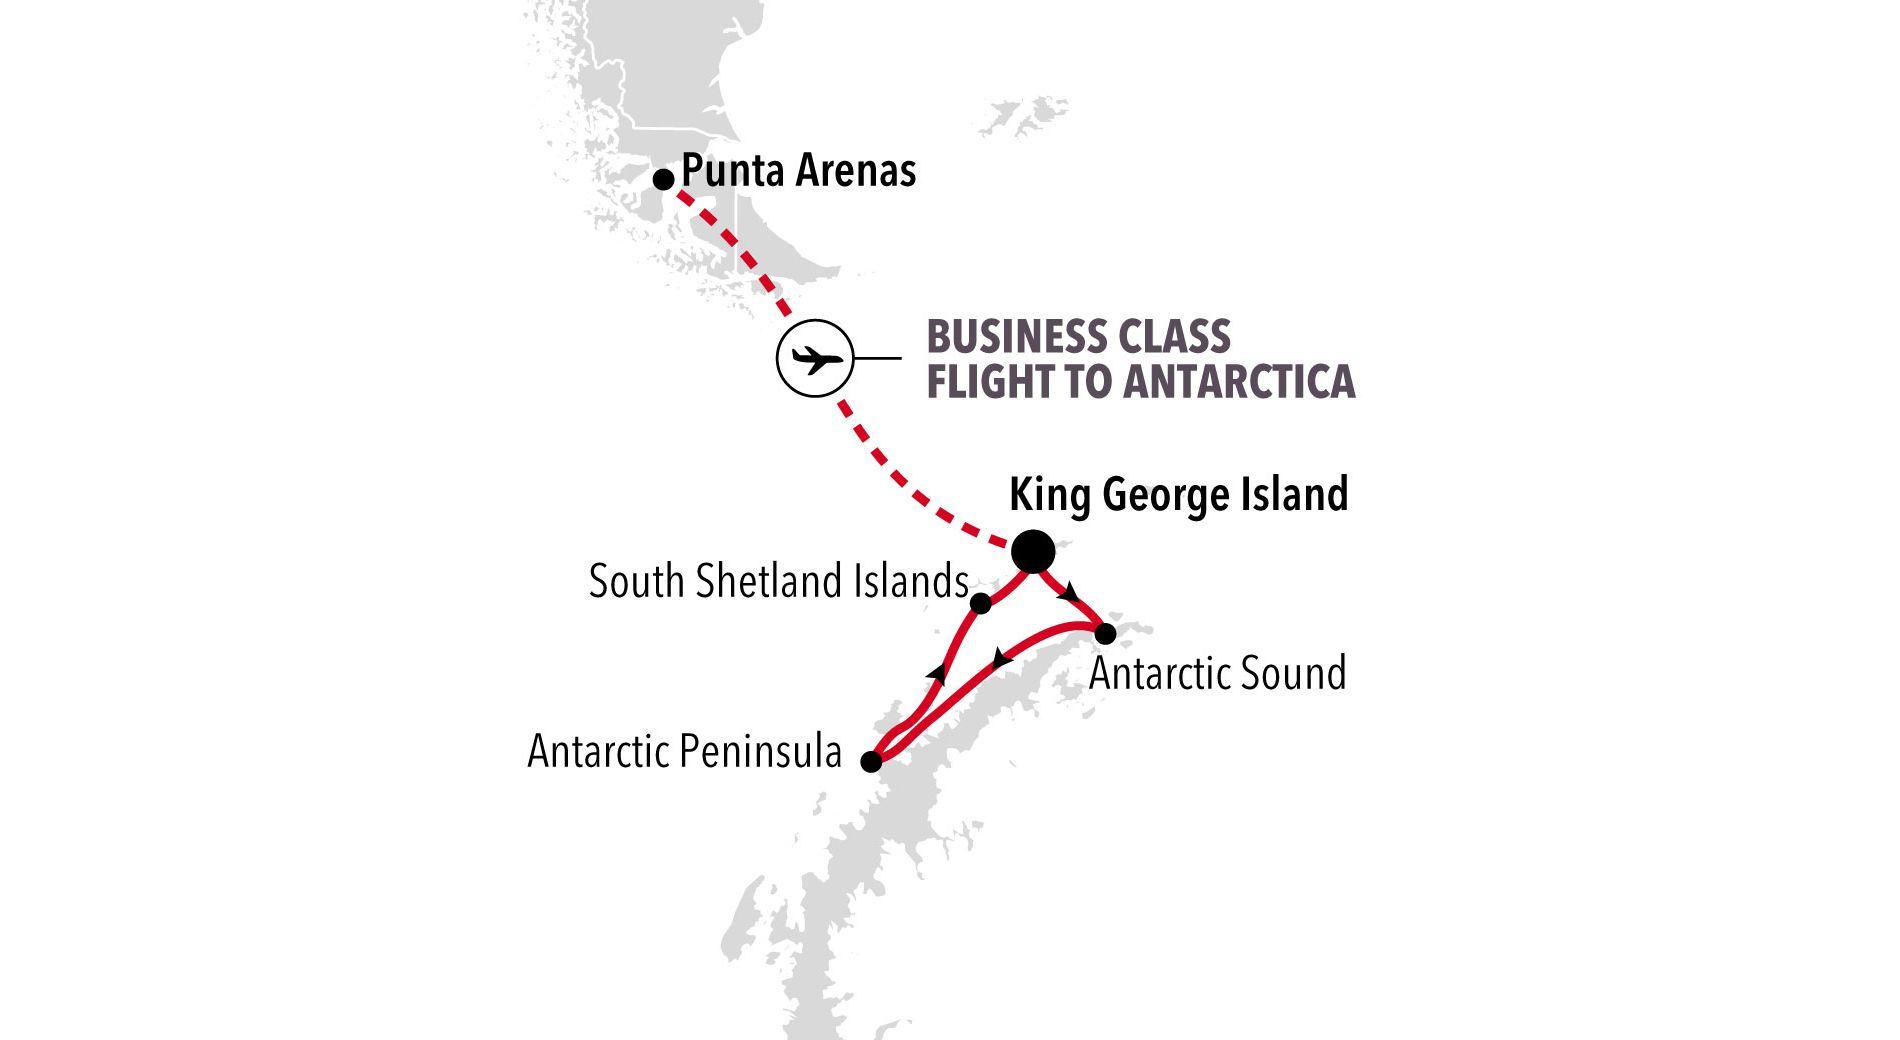 E1220124006 - King George Island to King George Island